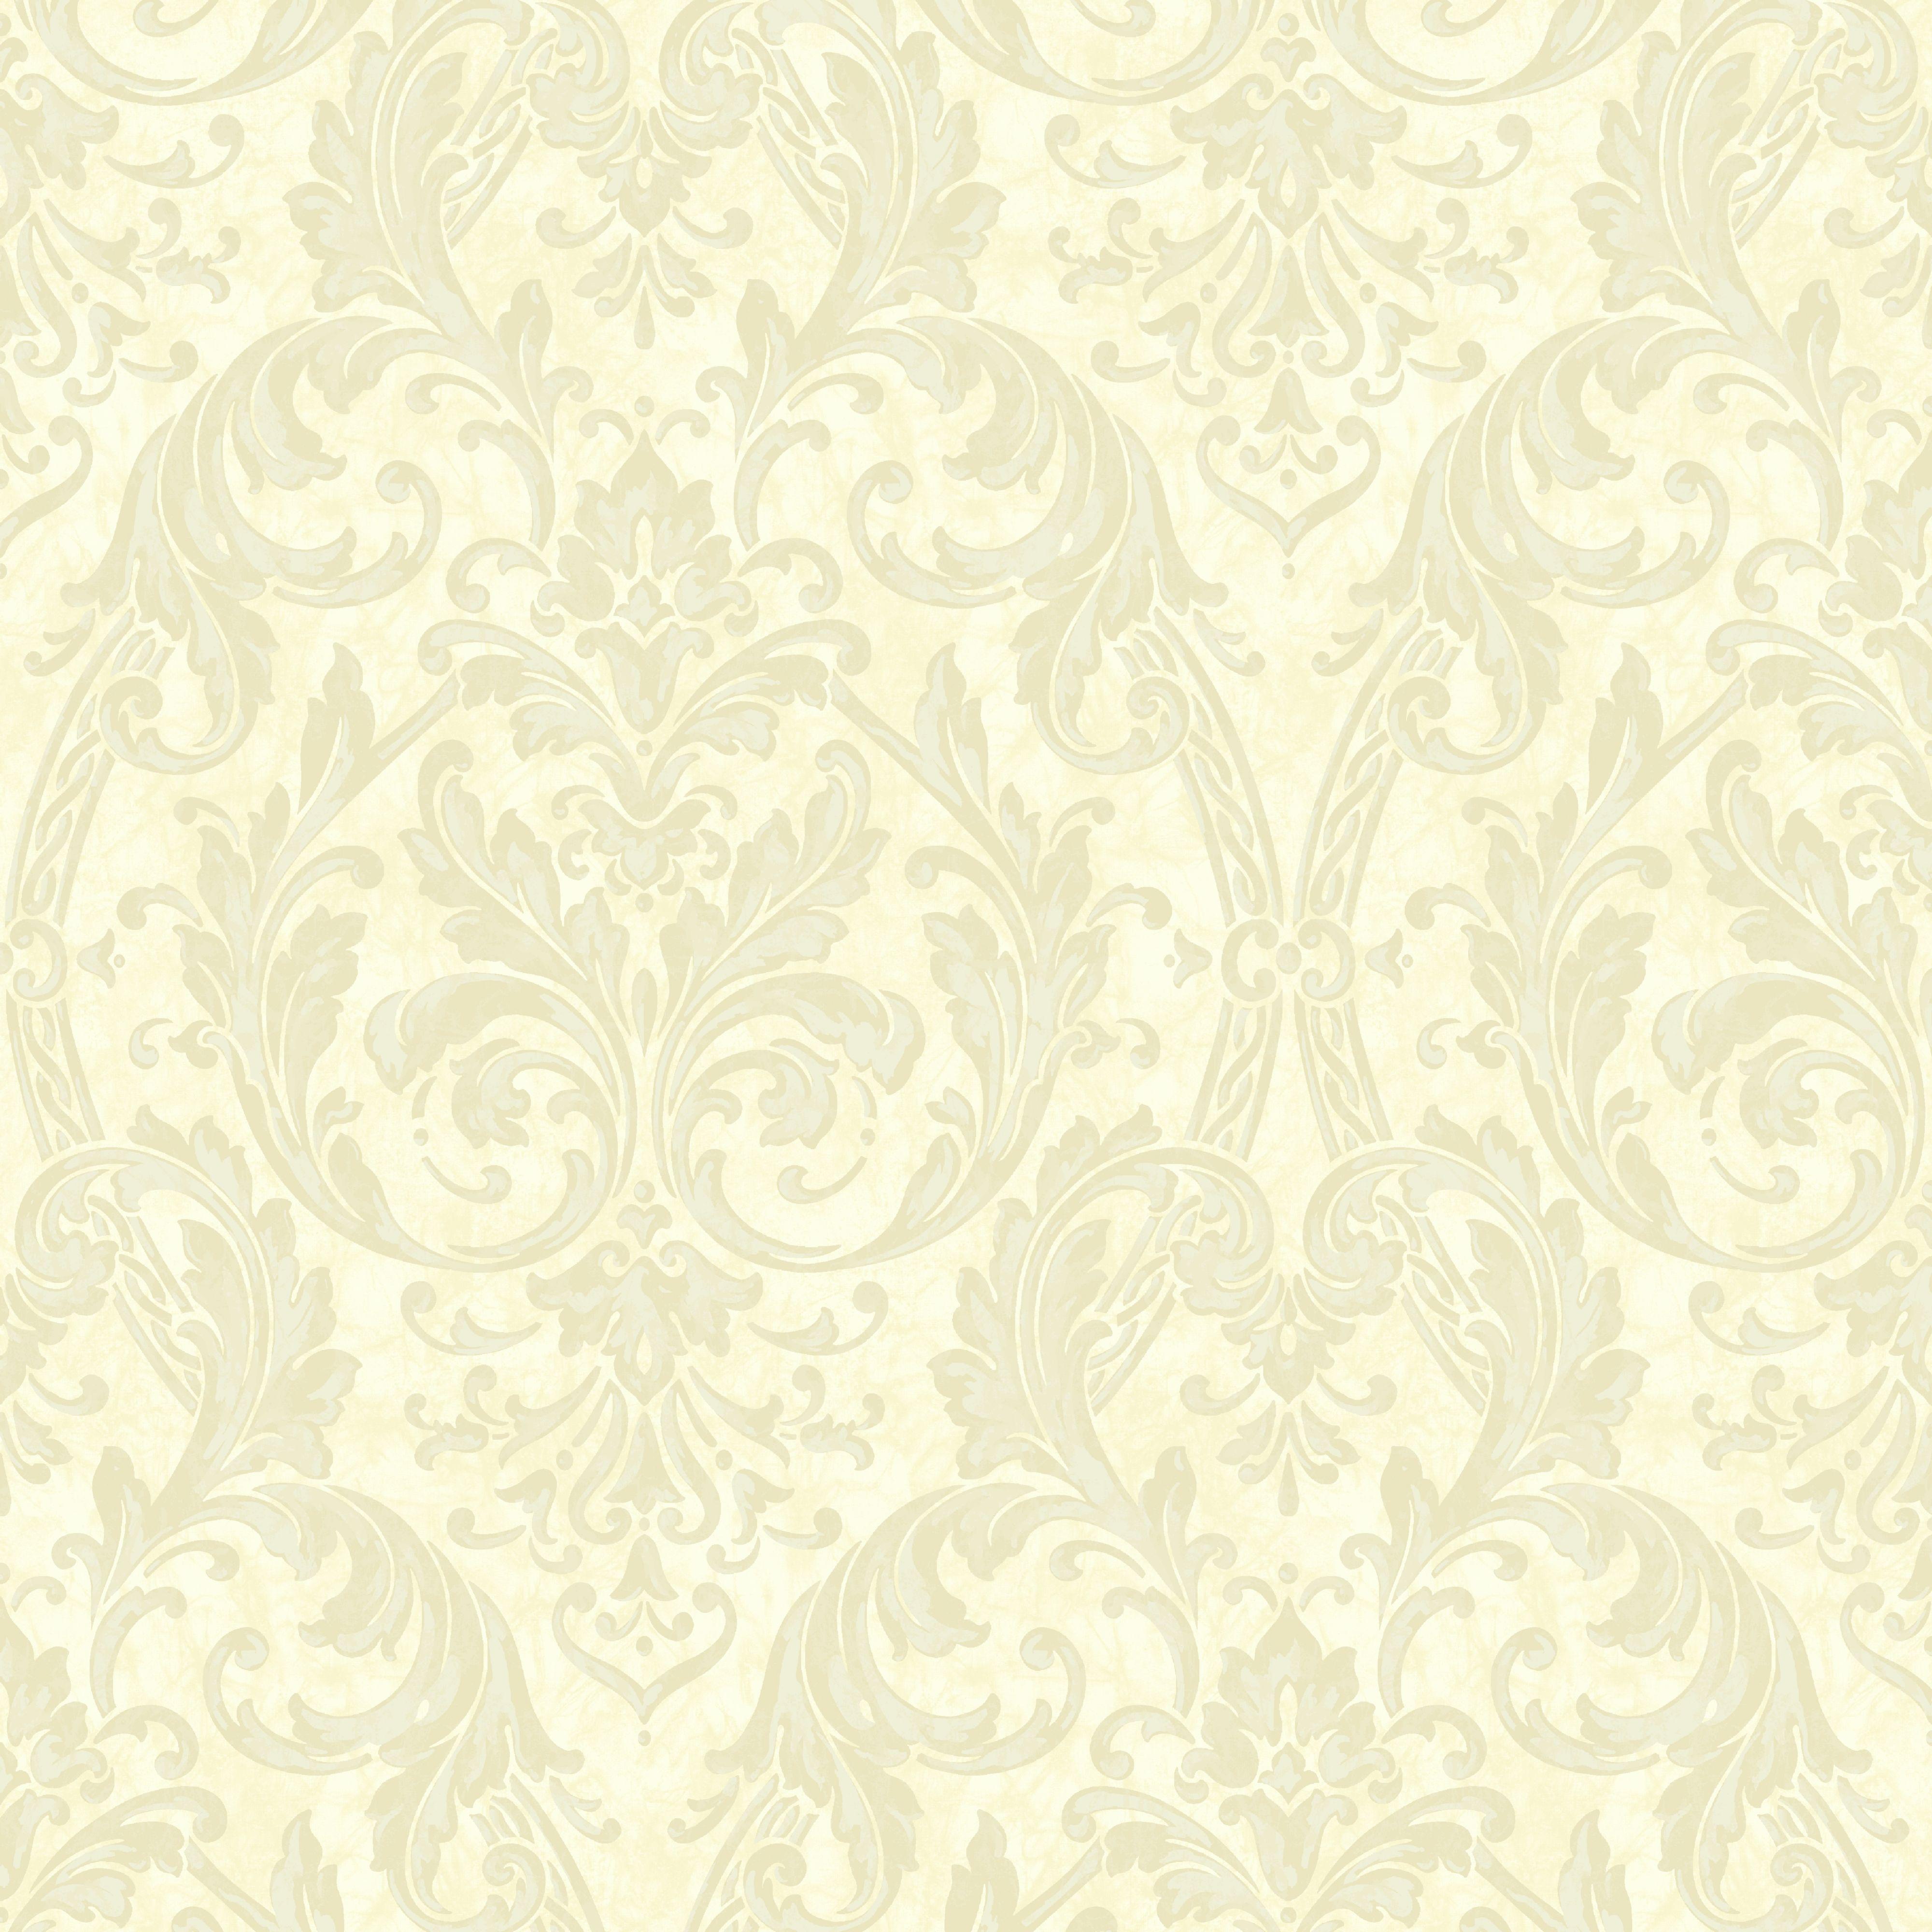 Elegant Cream Hallway With Damask Wallpaper: Arthouse Medici Latte Damask Wallpaper